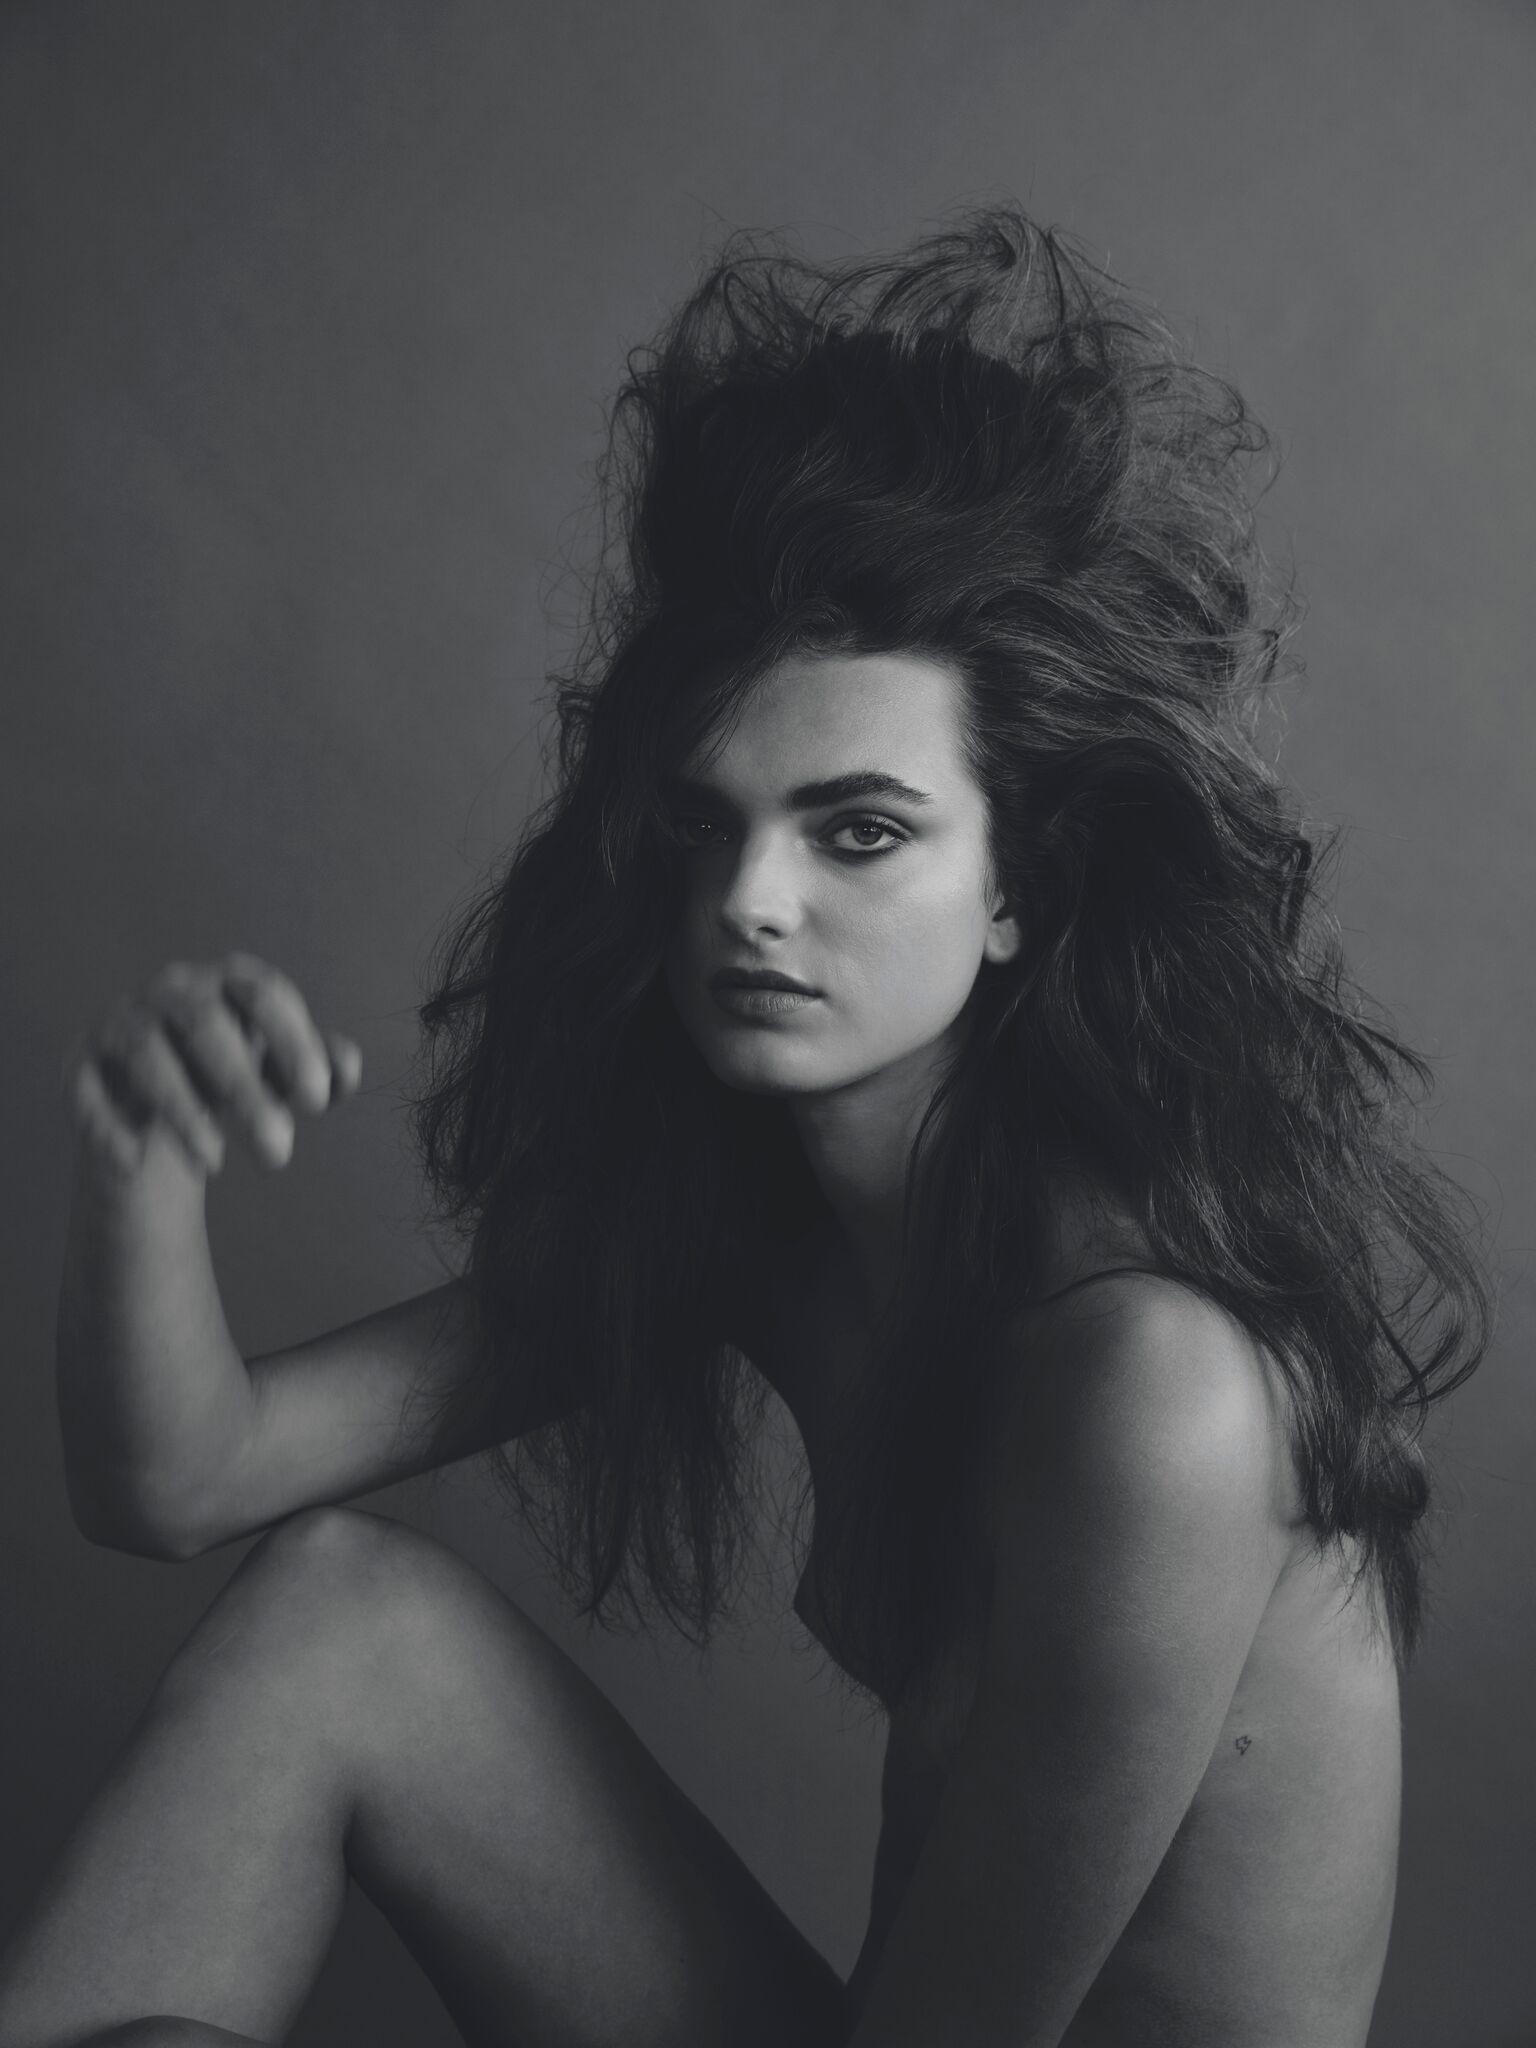 australian-beauty bentley-mescall lauren-mccowan georgia-fowler lauren-king-creative